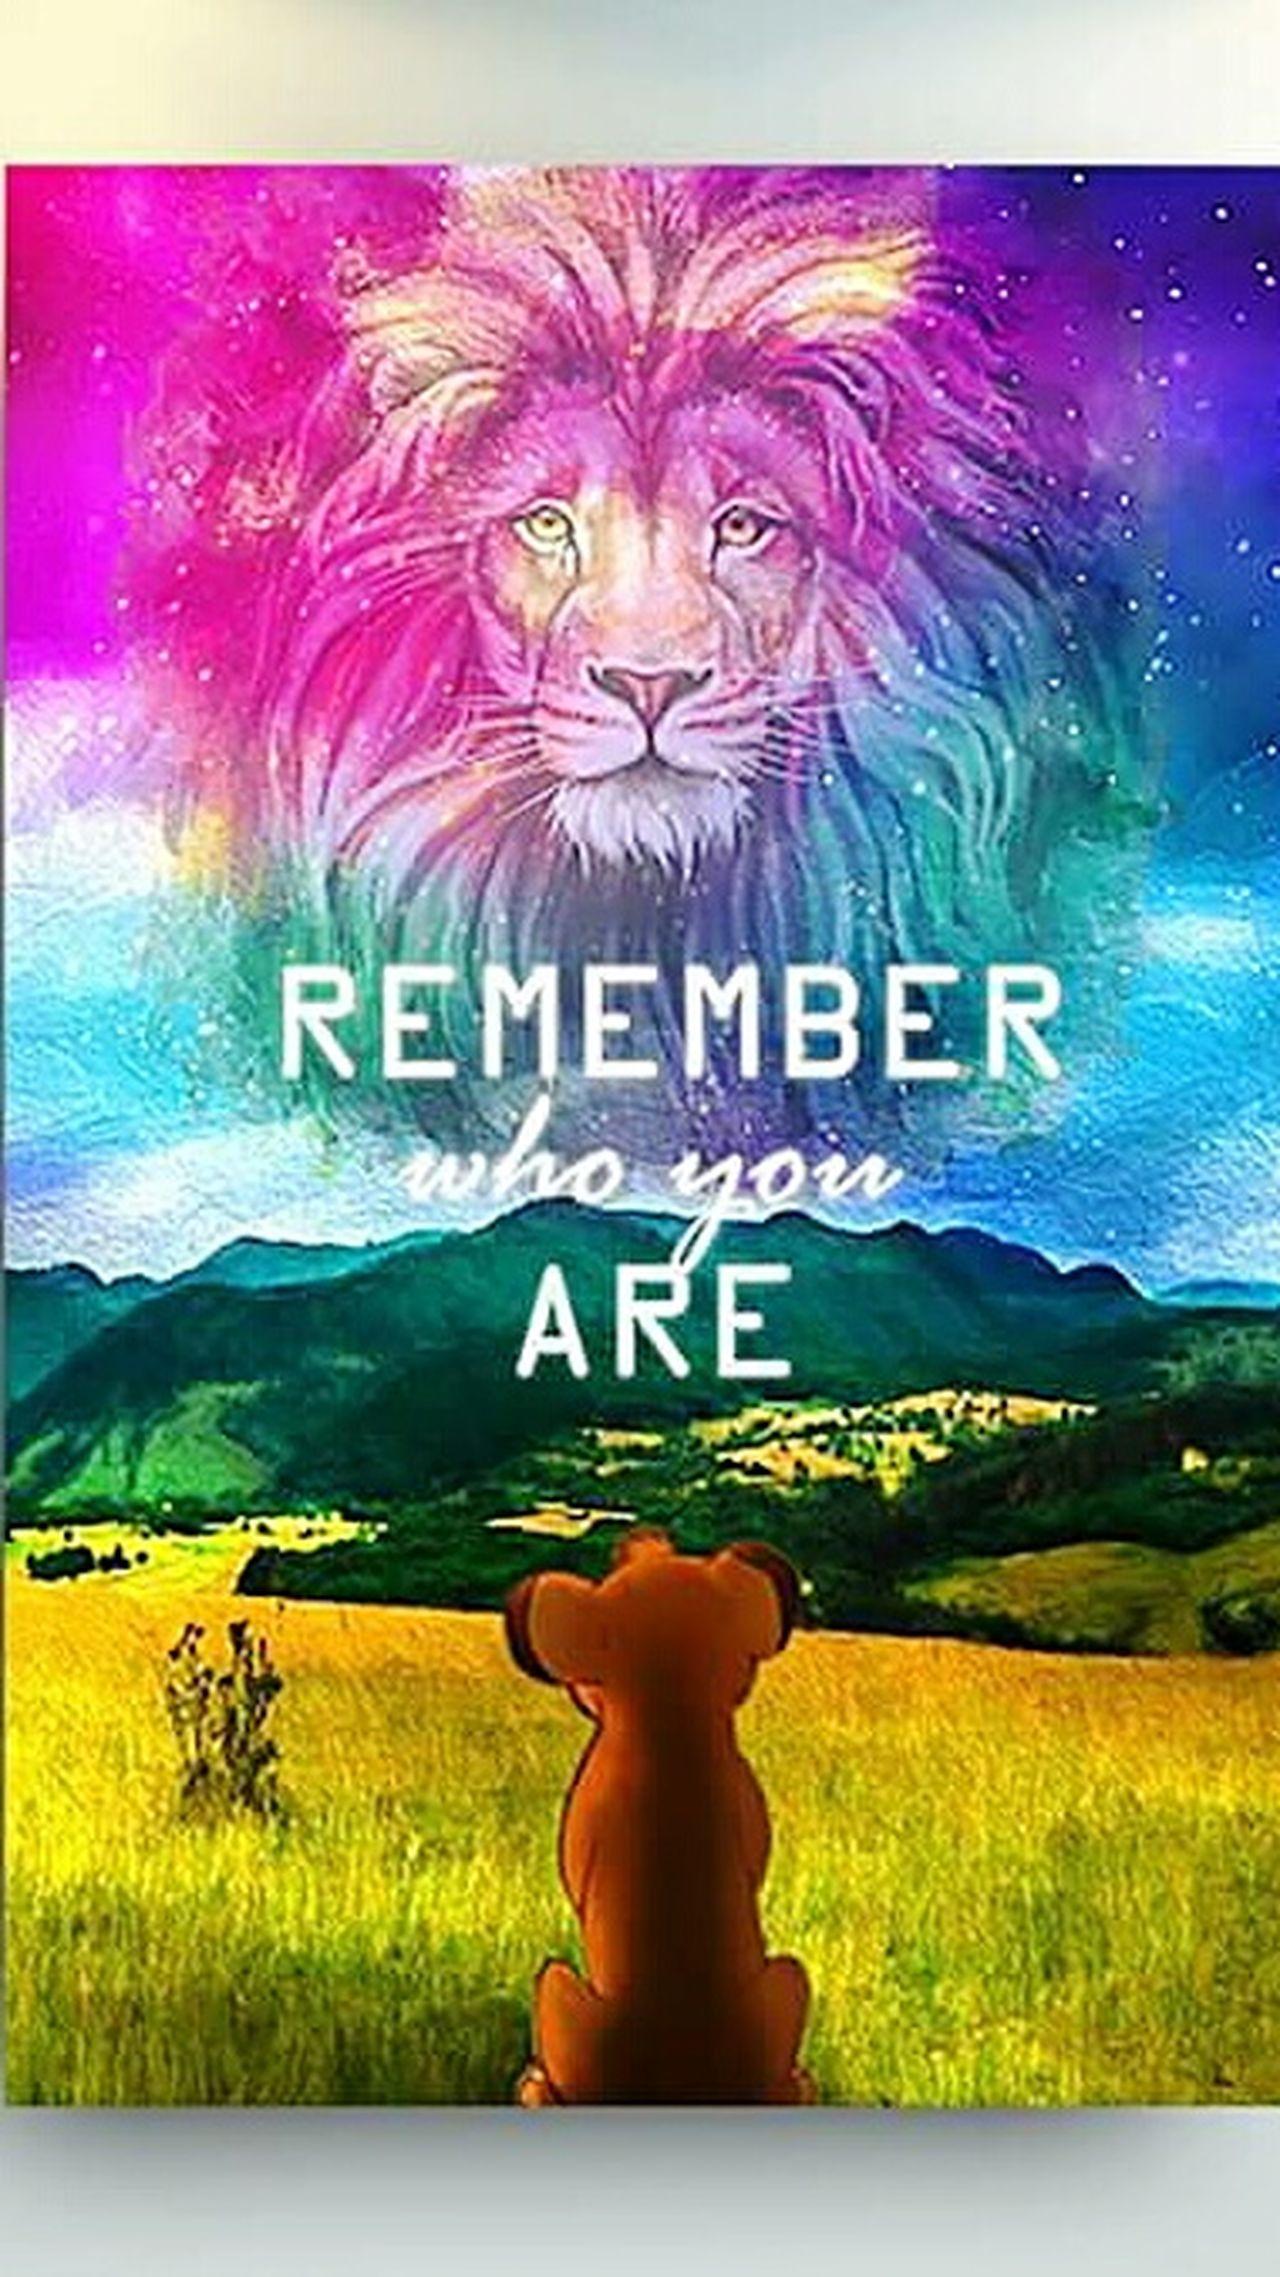 König Der Löwen   King Of Lions Simba Love Lion Löwe  Tattoo Remember Who You Are ♡ 😚